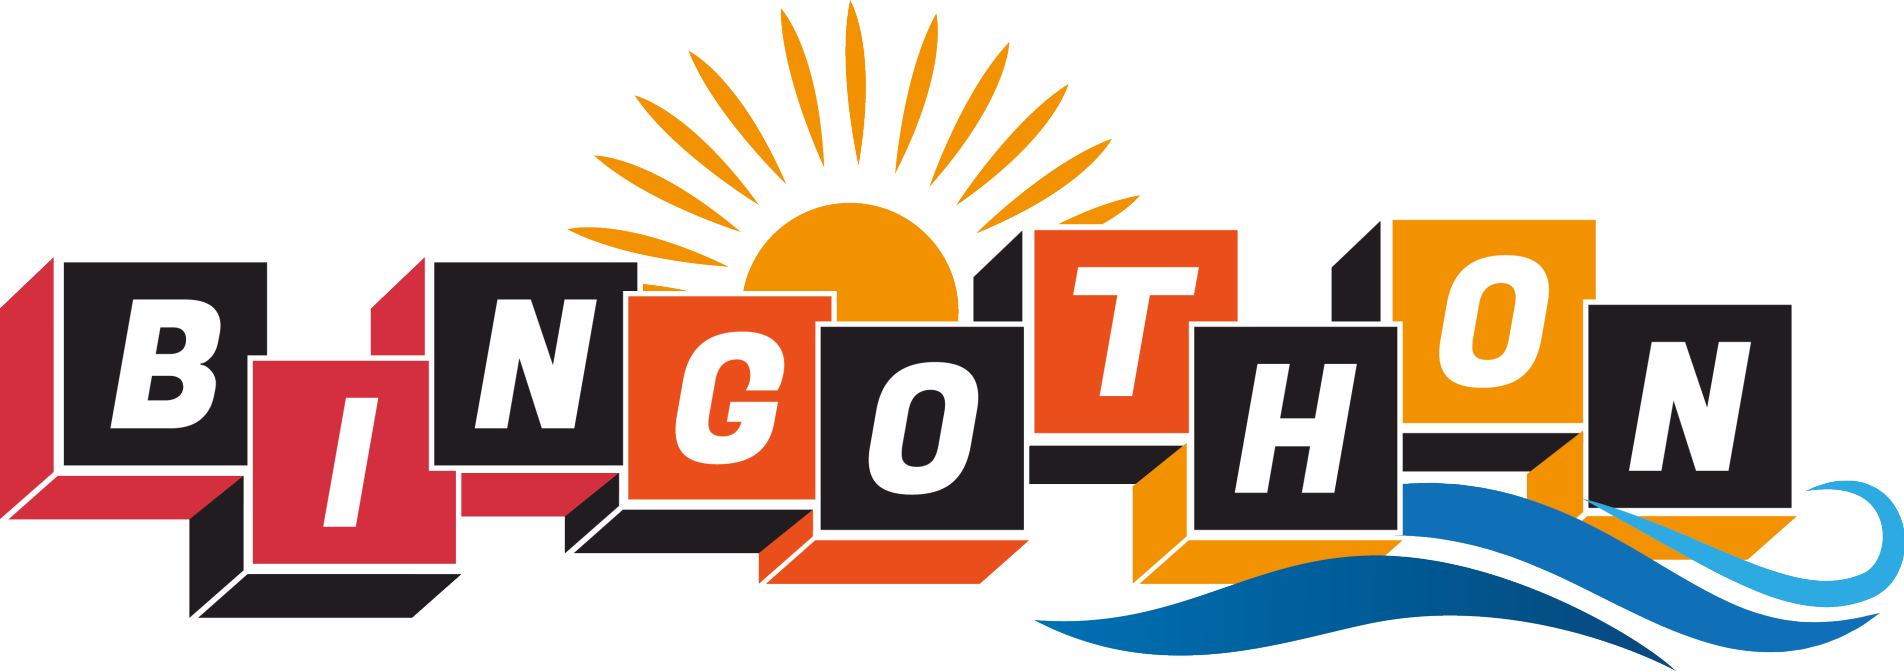 Bingothon Summer 2020 Horizontal Logo